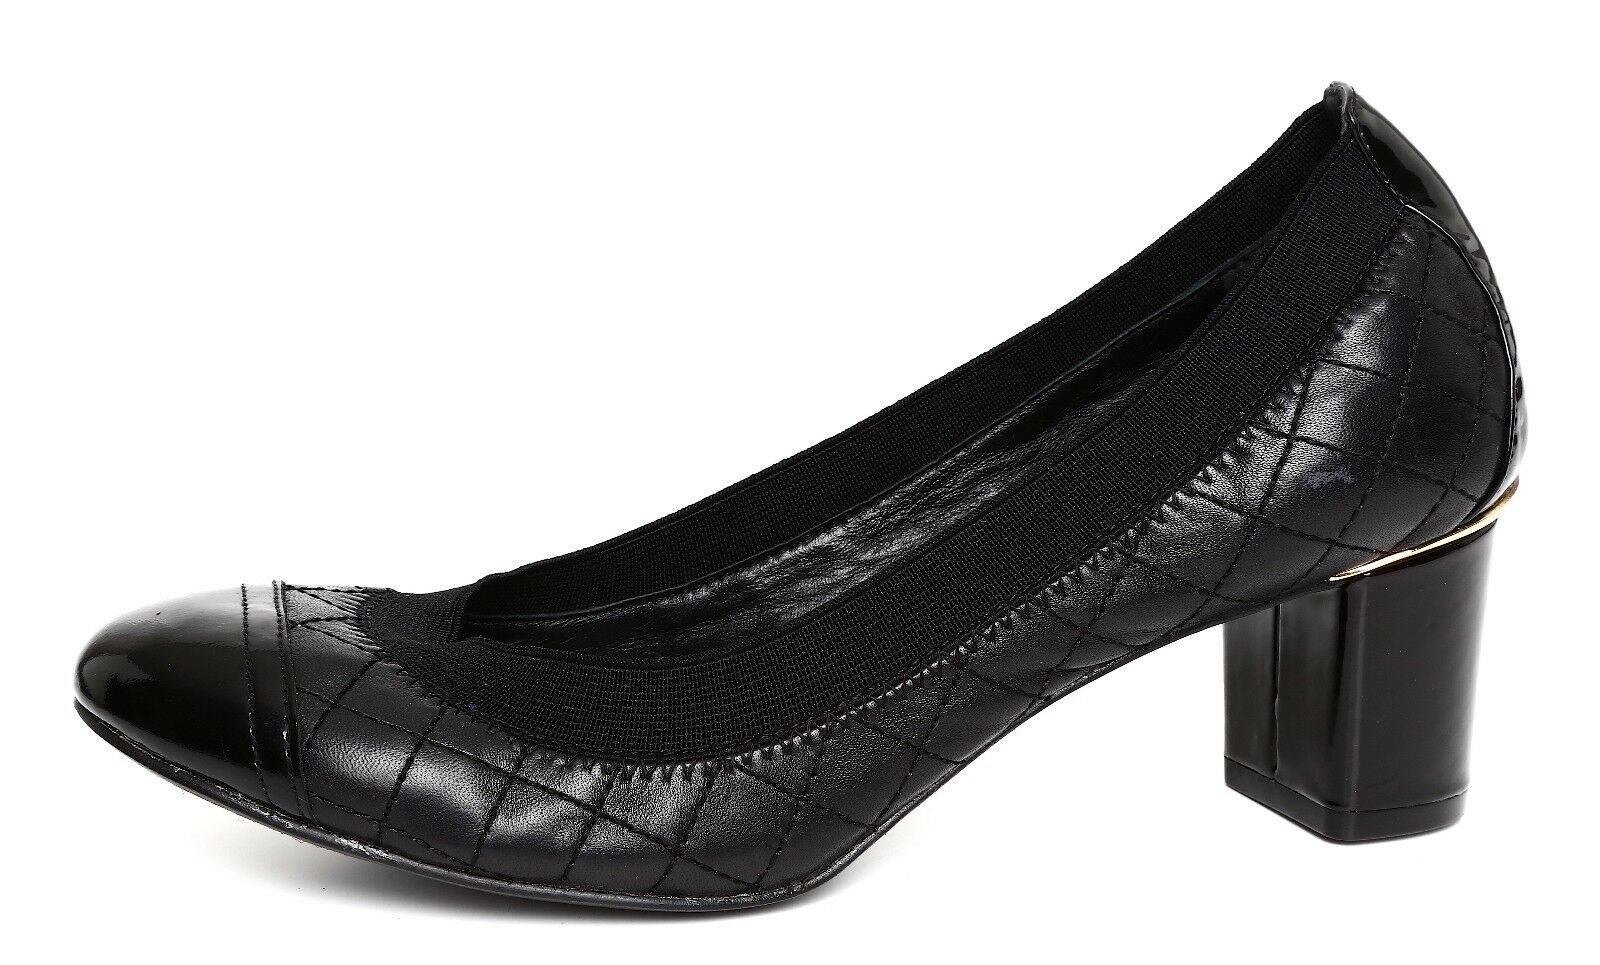 edizione limitata Tory Burch Carrie Carrie Carrie Donna  Quilted nero Leather Cap Toe Pump Sz 6.5M 3198  ti aspetto